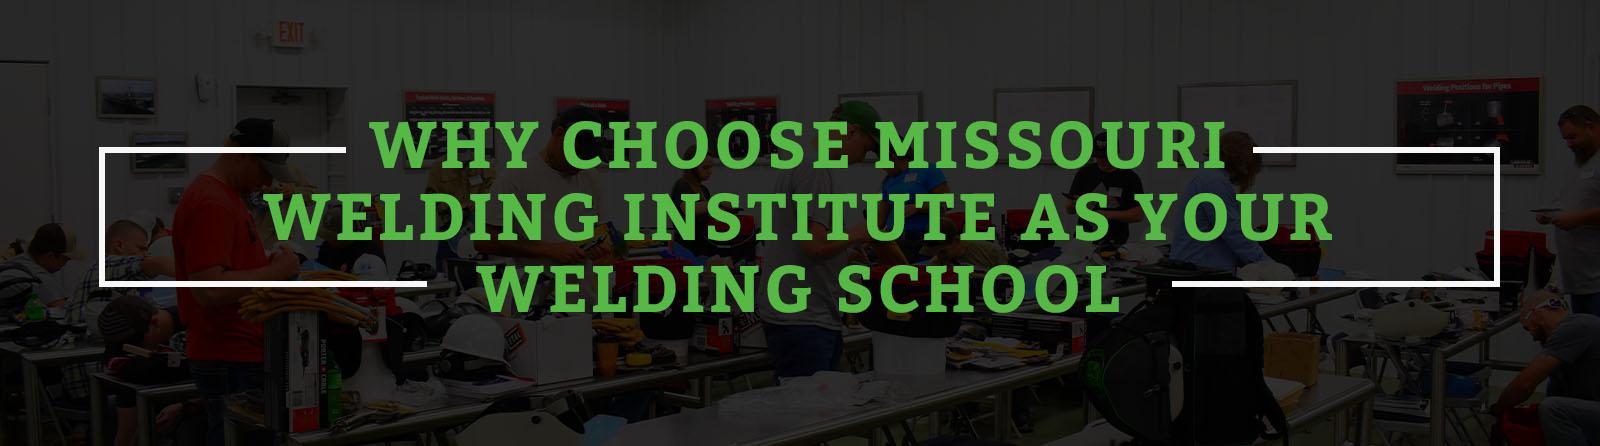 WHY CHOOSE MISSOURI WELDING INSTITUTE AS YOUR WELDING SCHOOL